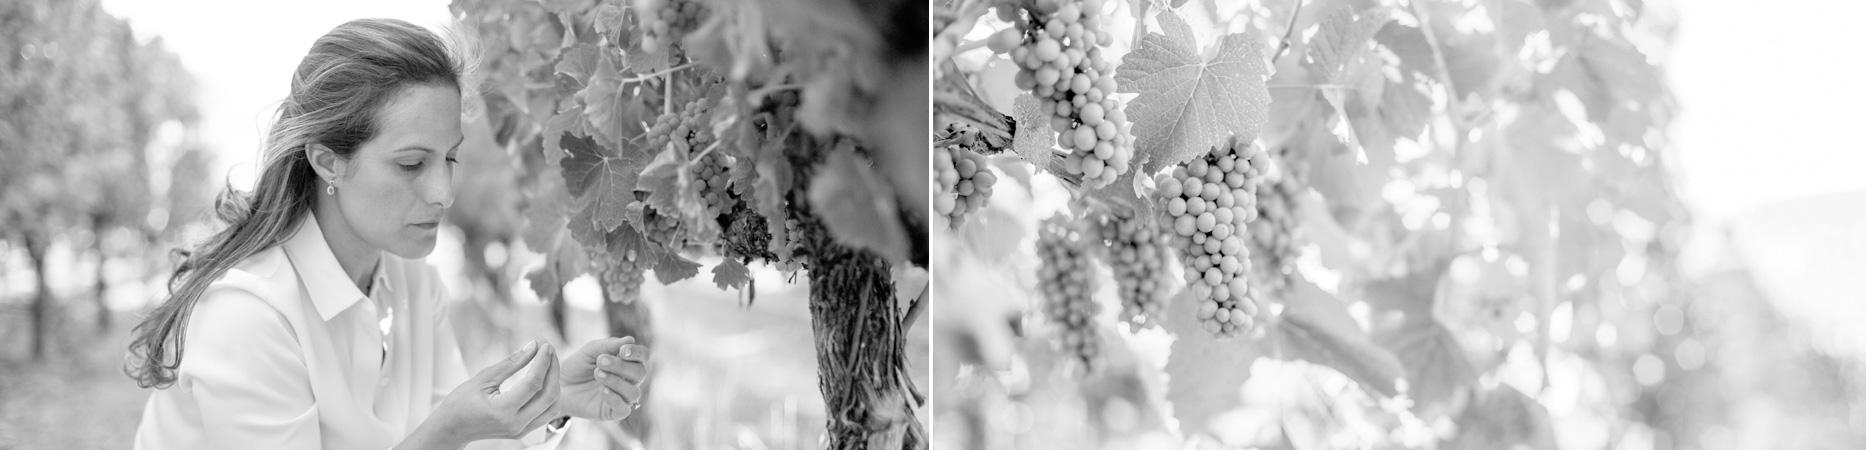 Bibiana Visiting the Vineyards